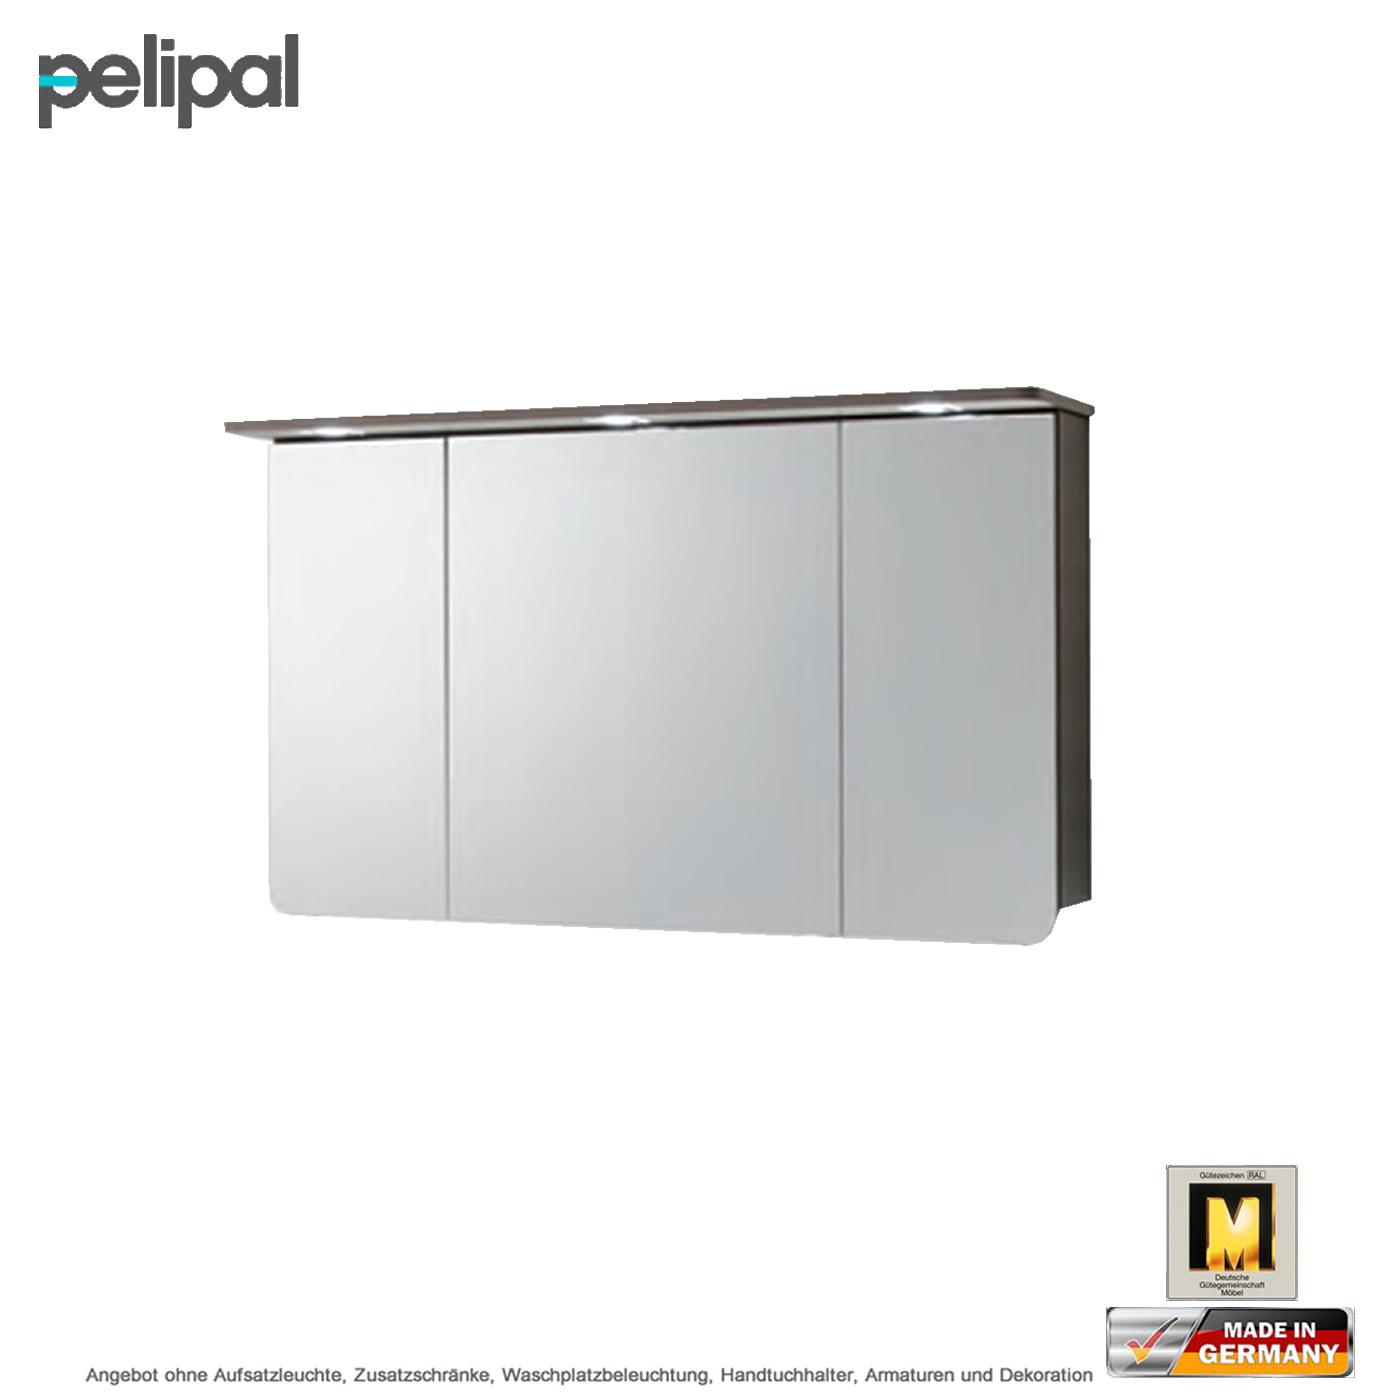 pelipal solitaire 6005 spiegelschrank 120 cm mit led kranz beleuchtung impulsbad. Black Bedroom Furniture Sets. Home Design Ideas